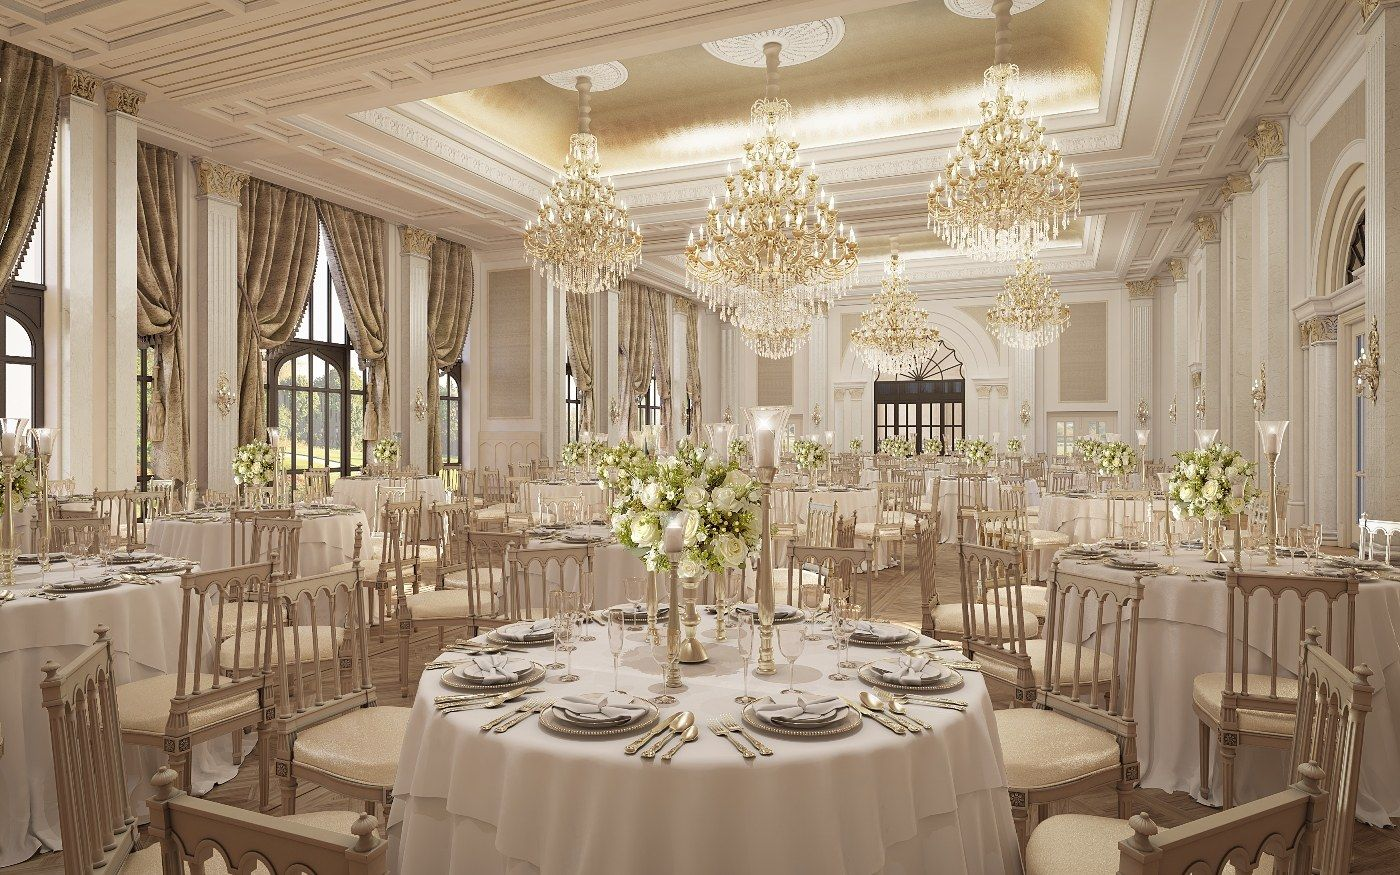 Adare Manor Hotel & Golf Resort (theadaremanor) on Pinterest